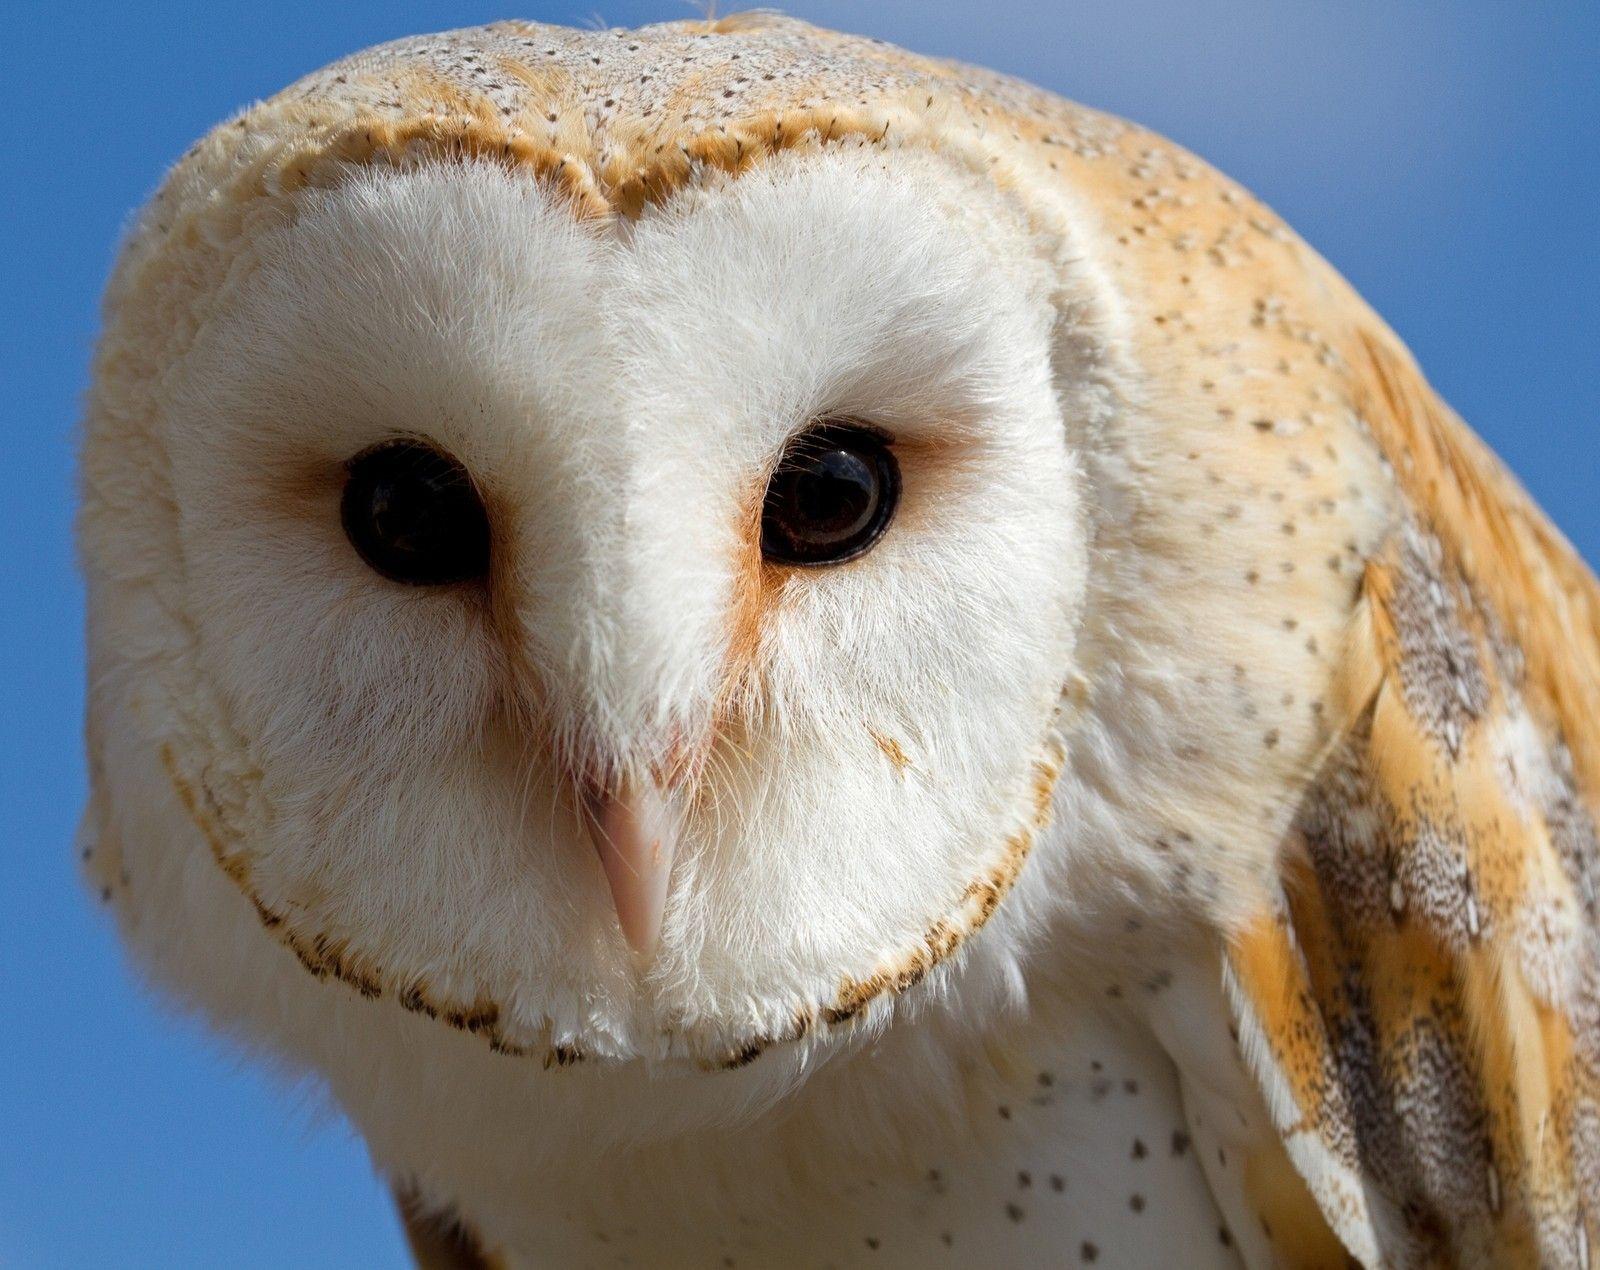 Details about Owl / Bird 8 x 10 / 8x10 GLOSSY Photo ...